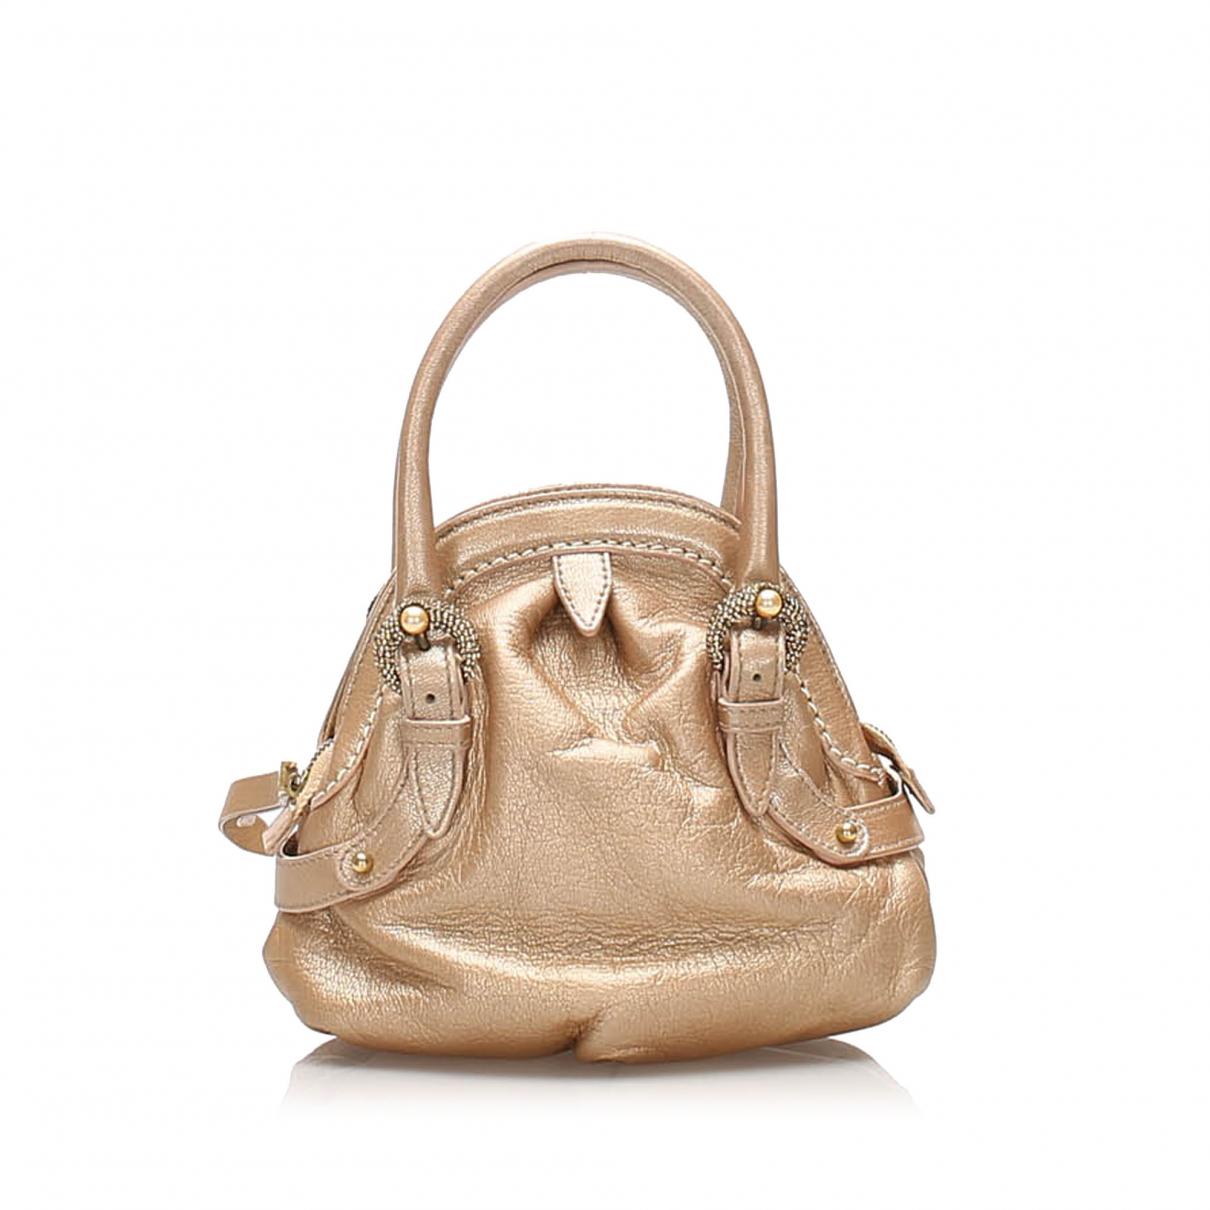 Salvatore Ferragamo N Brown Leather handbag for Women N